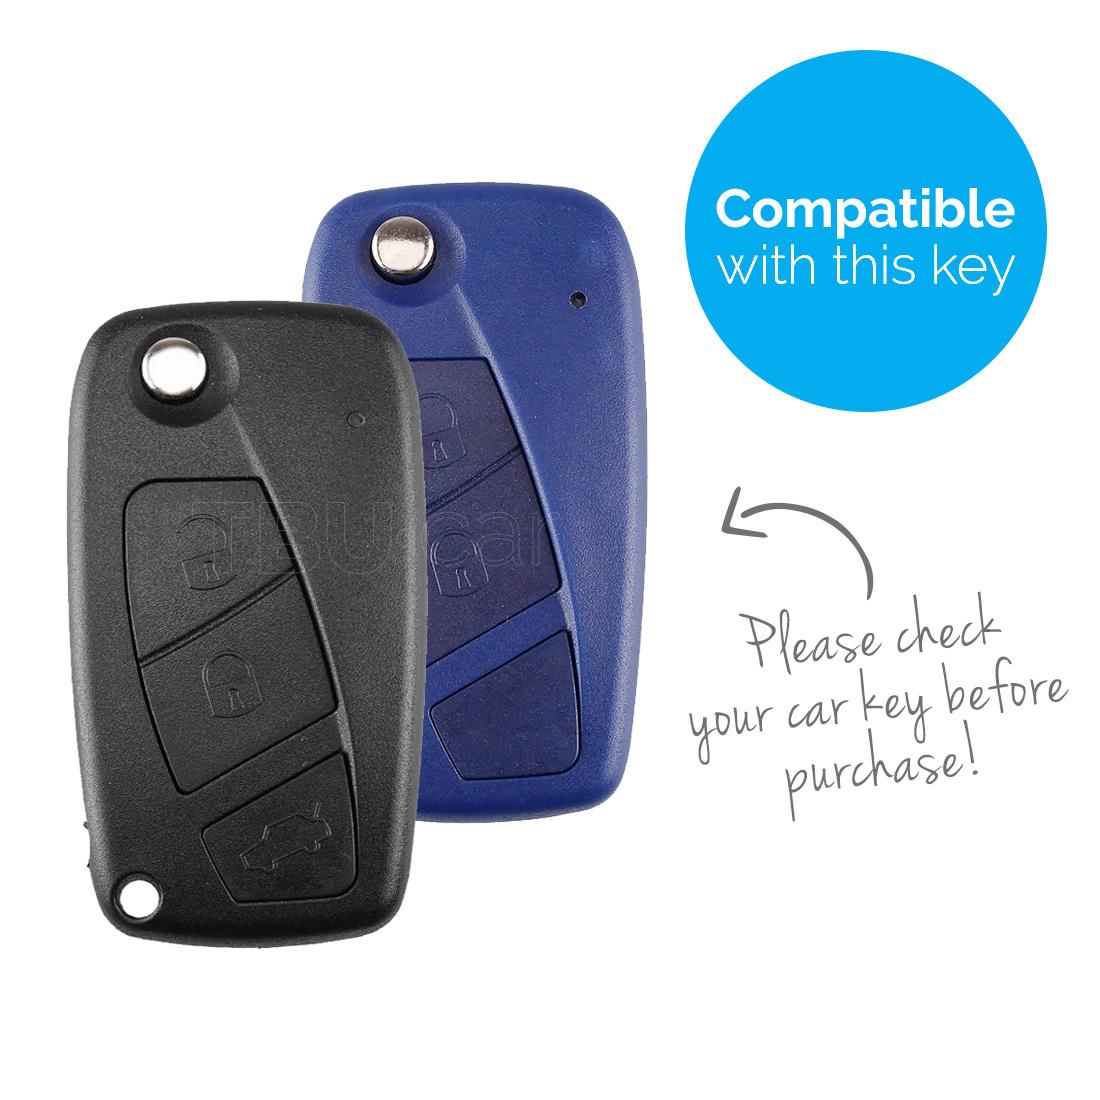 TBU car TBU car Autoschlüssel Hülle kompatibel mit Lancia 3 Tasten - Schutzhülle aus Silikon - Auto Schlüsselhülle Cover in Rosa